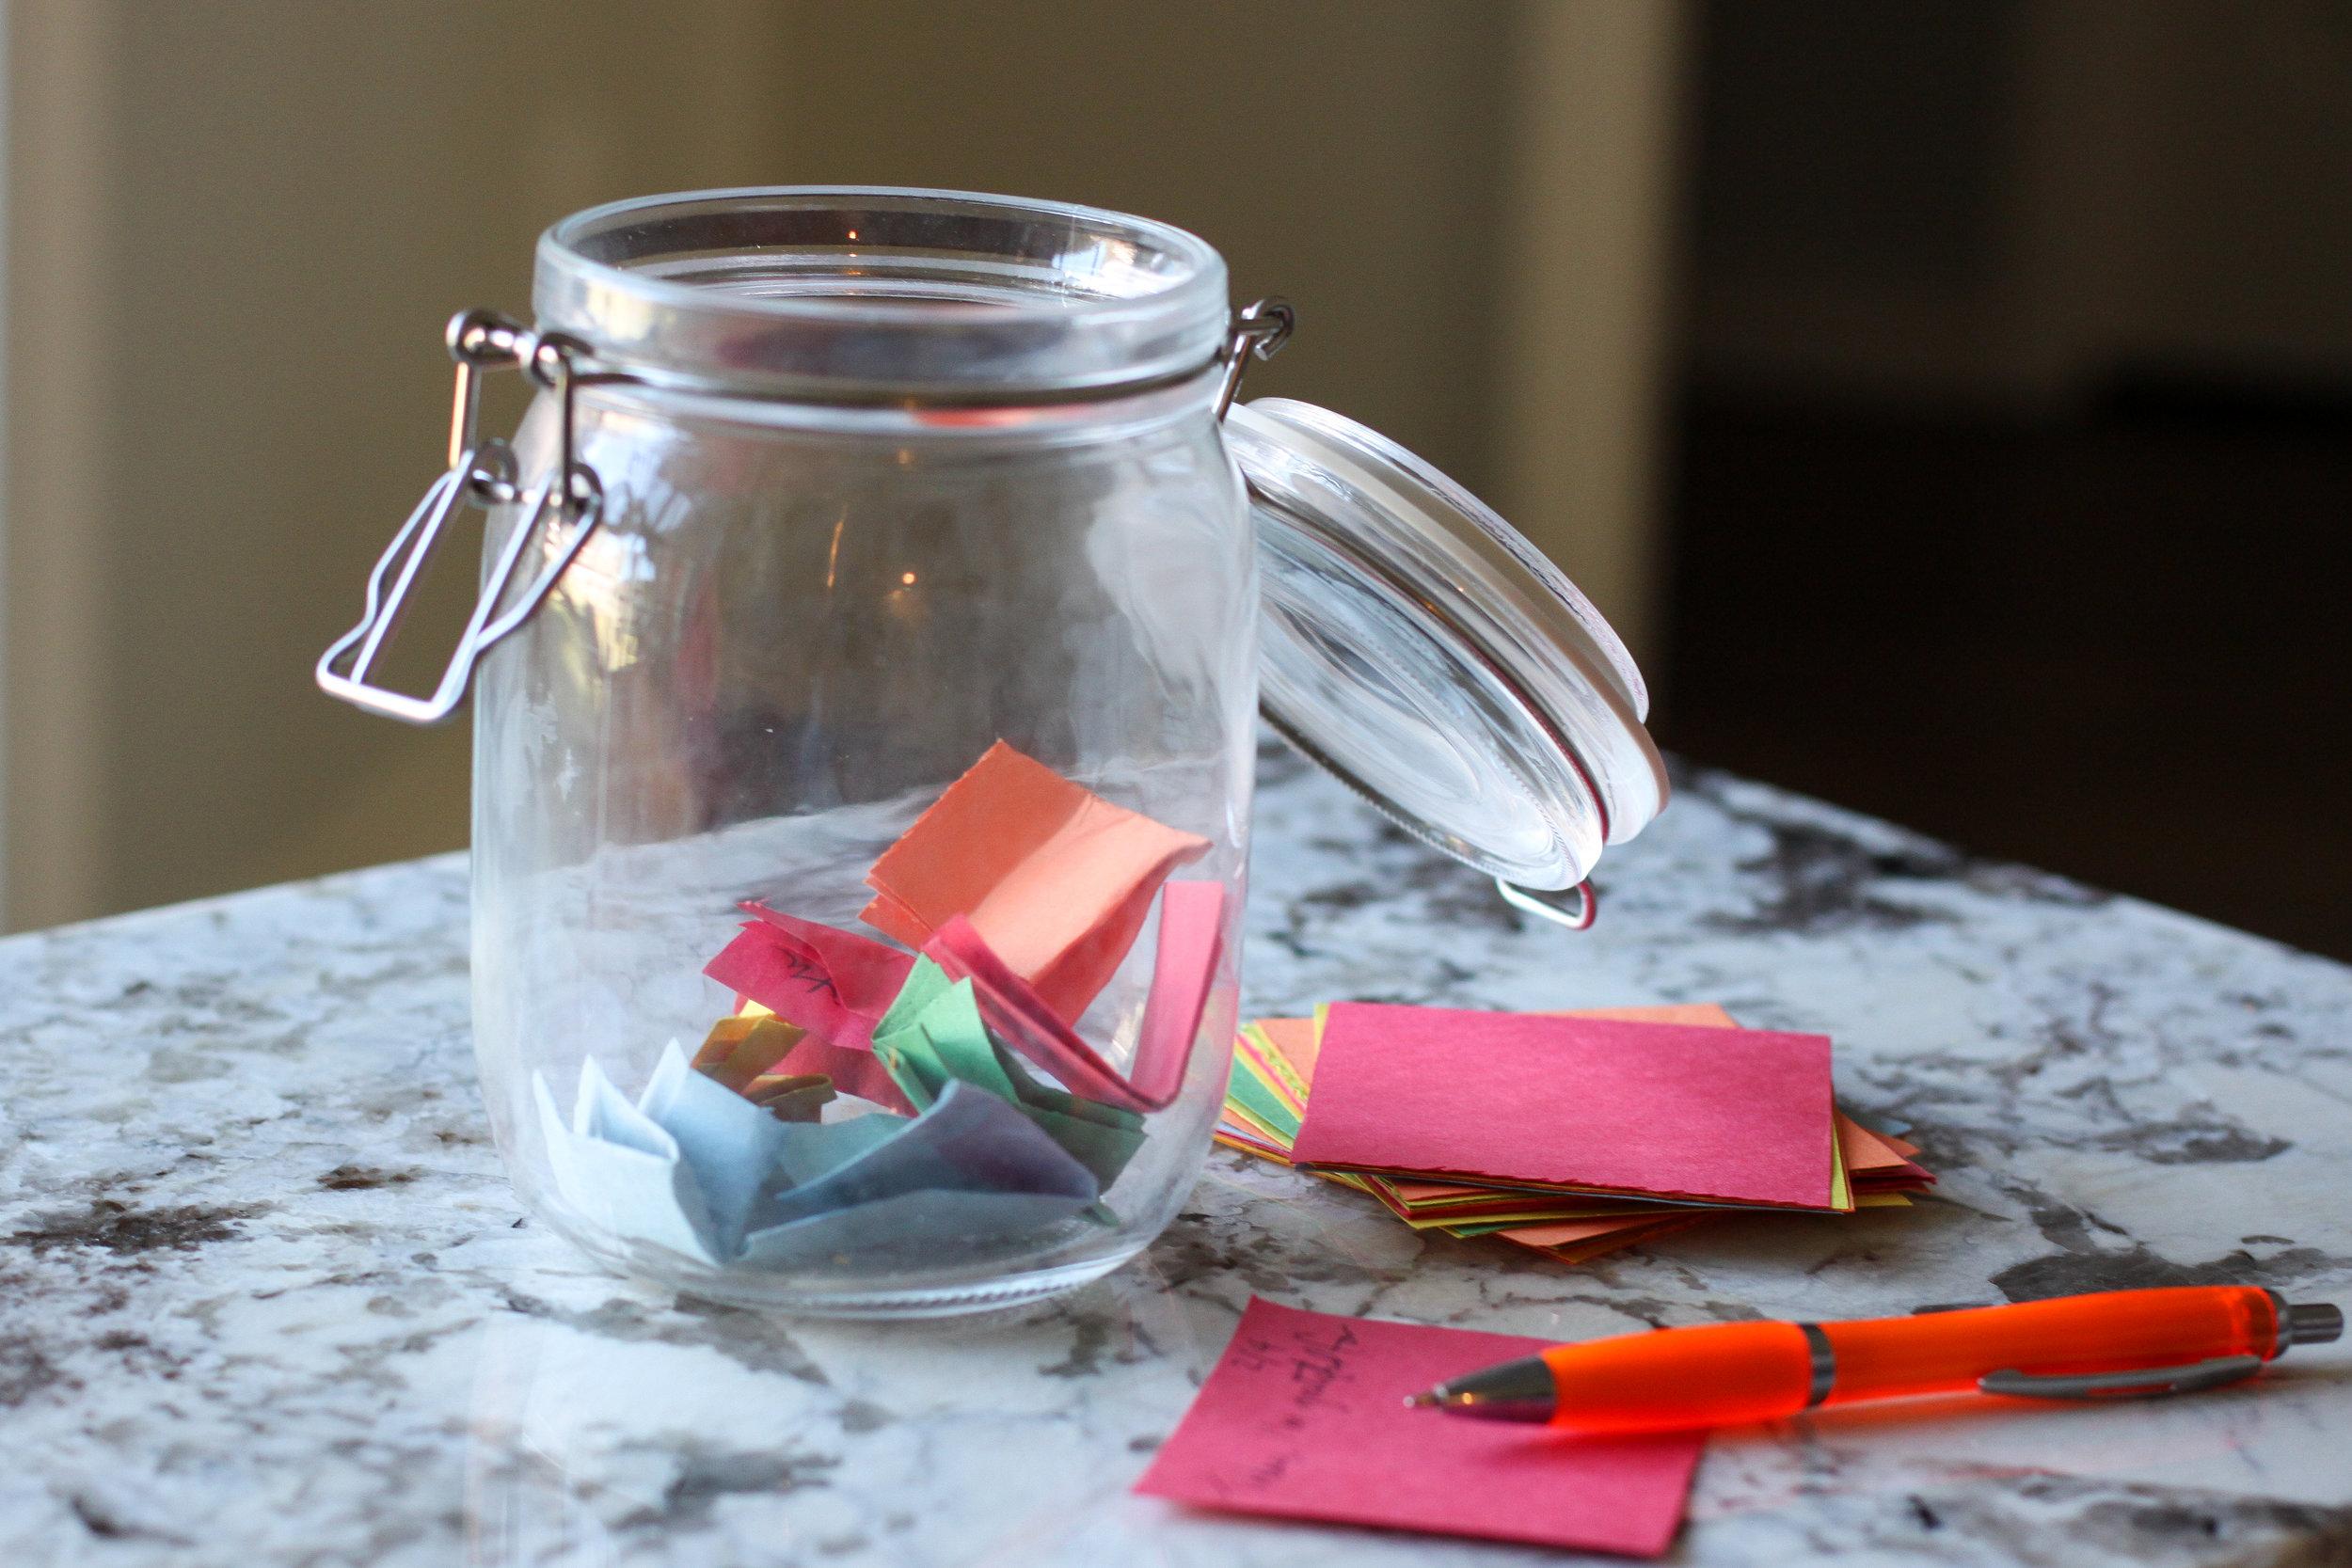 Teaching thankfulness at Valentine's Day with gratitude jars